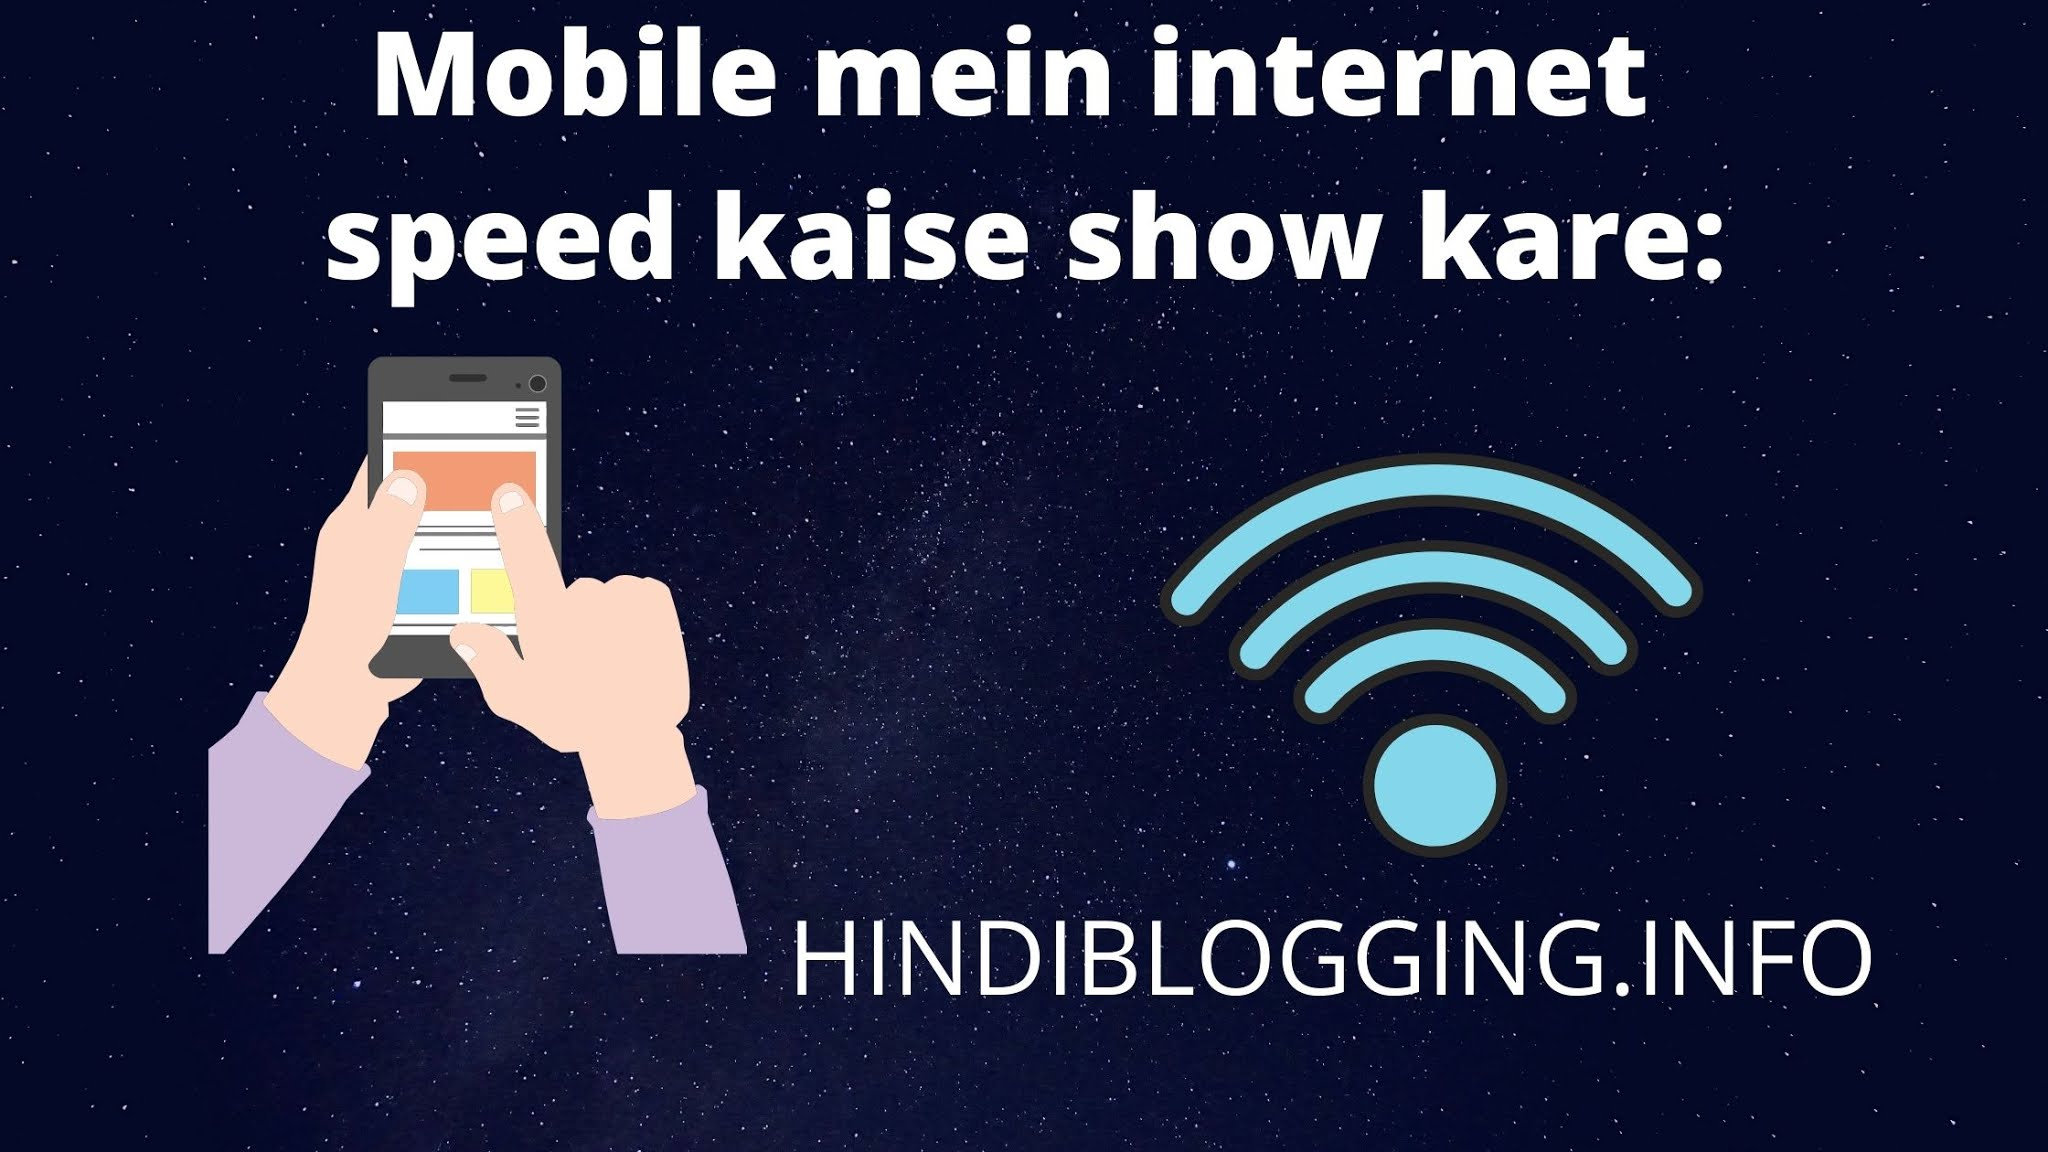 Mobile mein internet speed kaise show kare